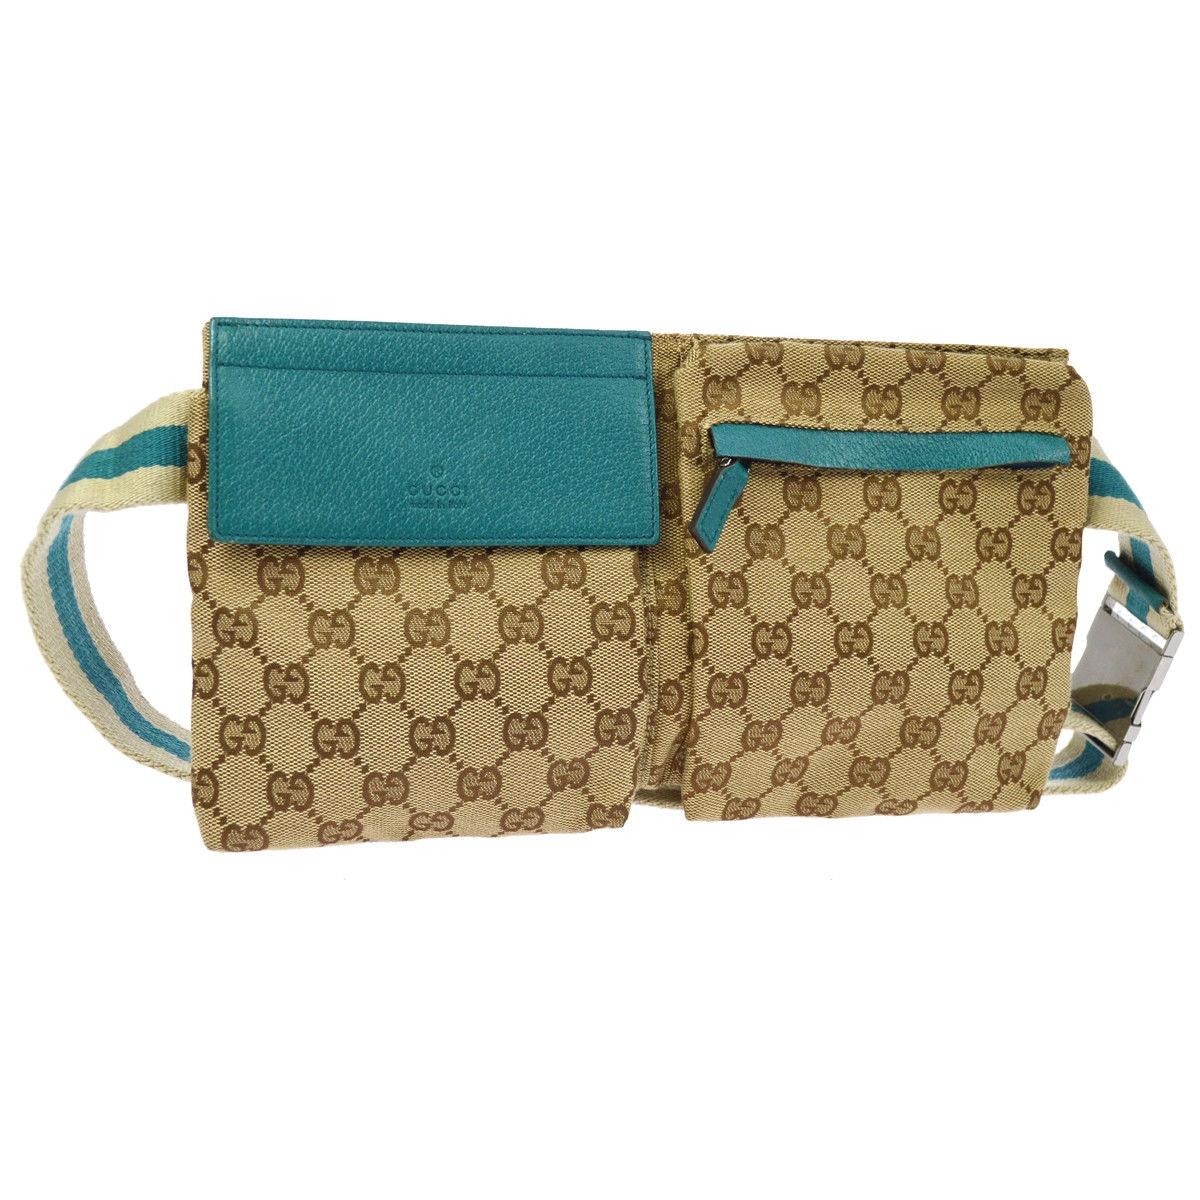 Gucci Flap Waist Bag GG Monogram Brown/Beige/Turquoise